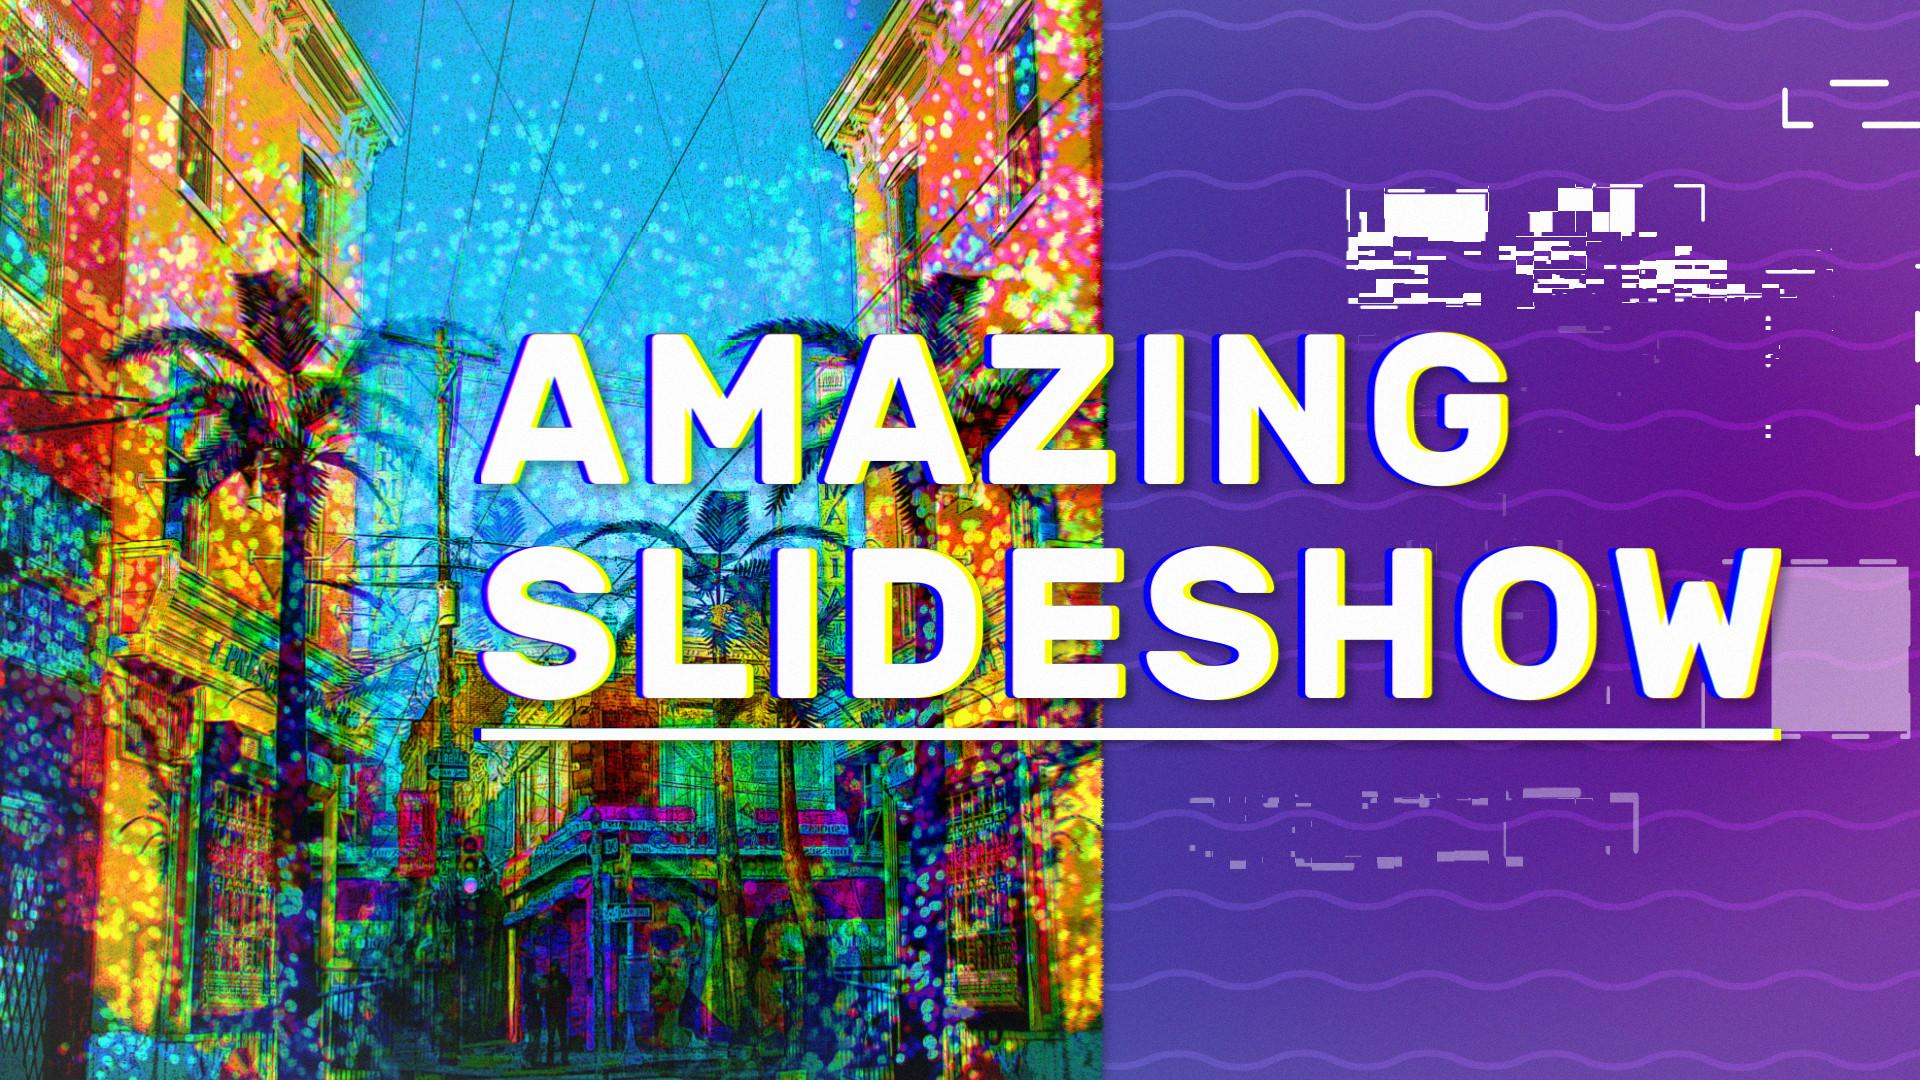 Glitch Slideshow 97881 - Free download